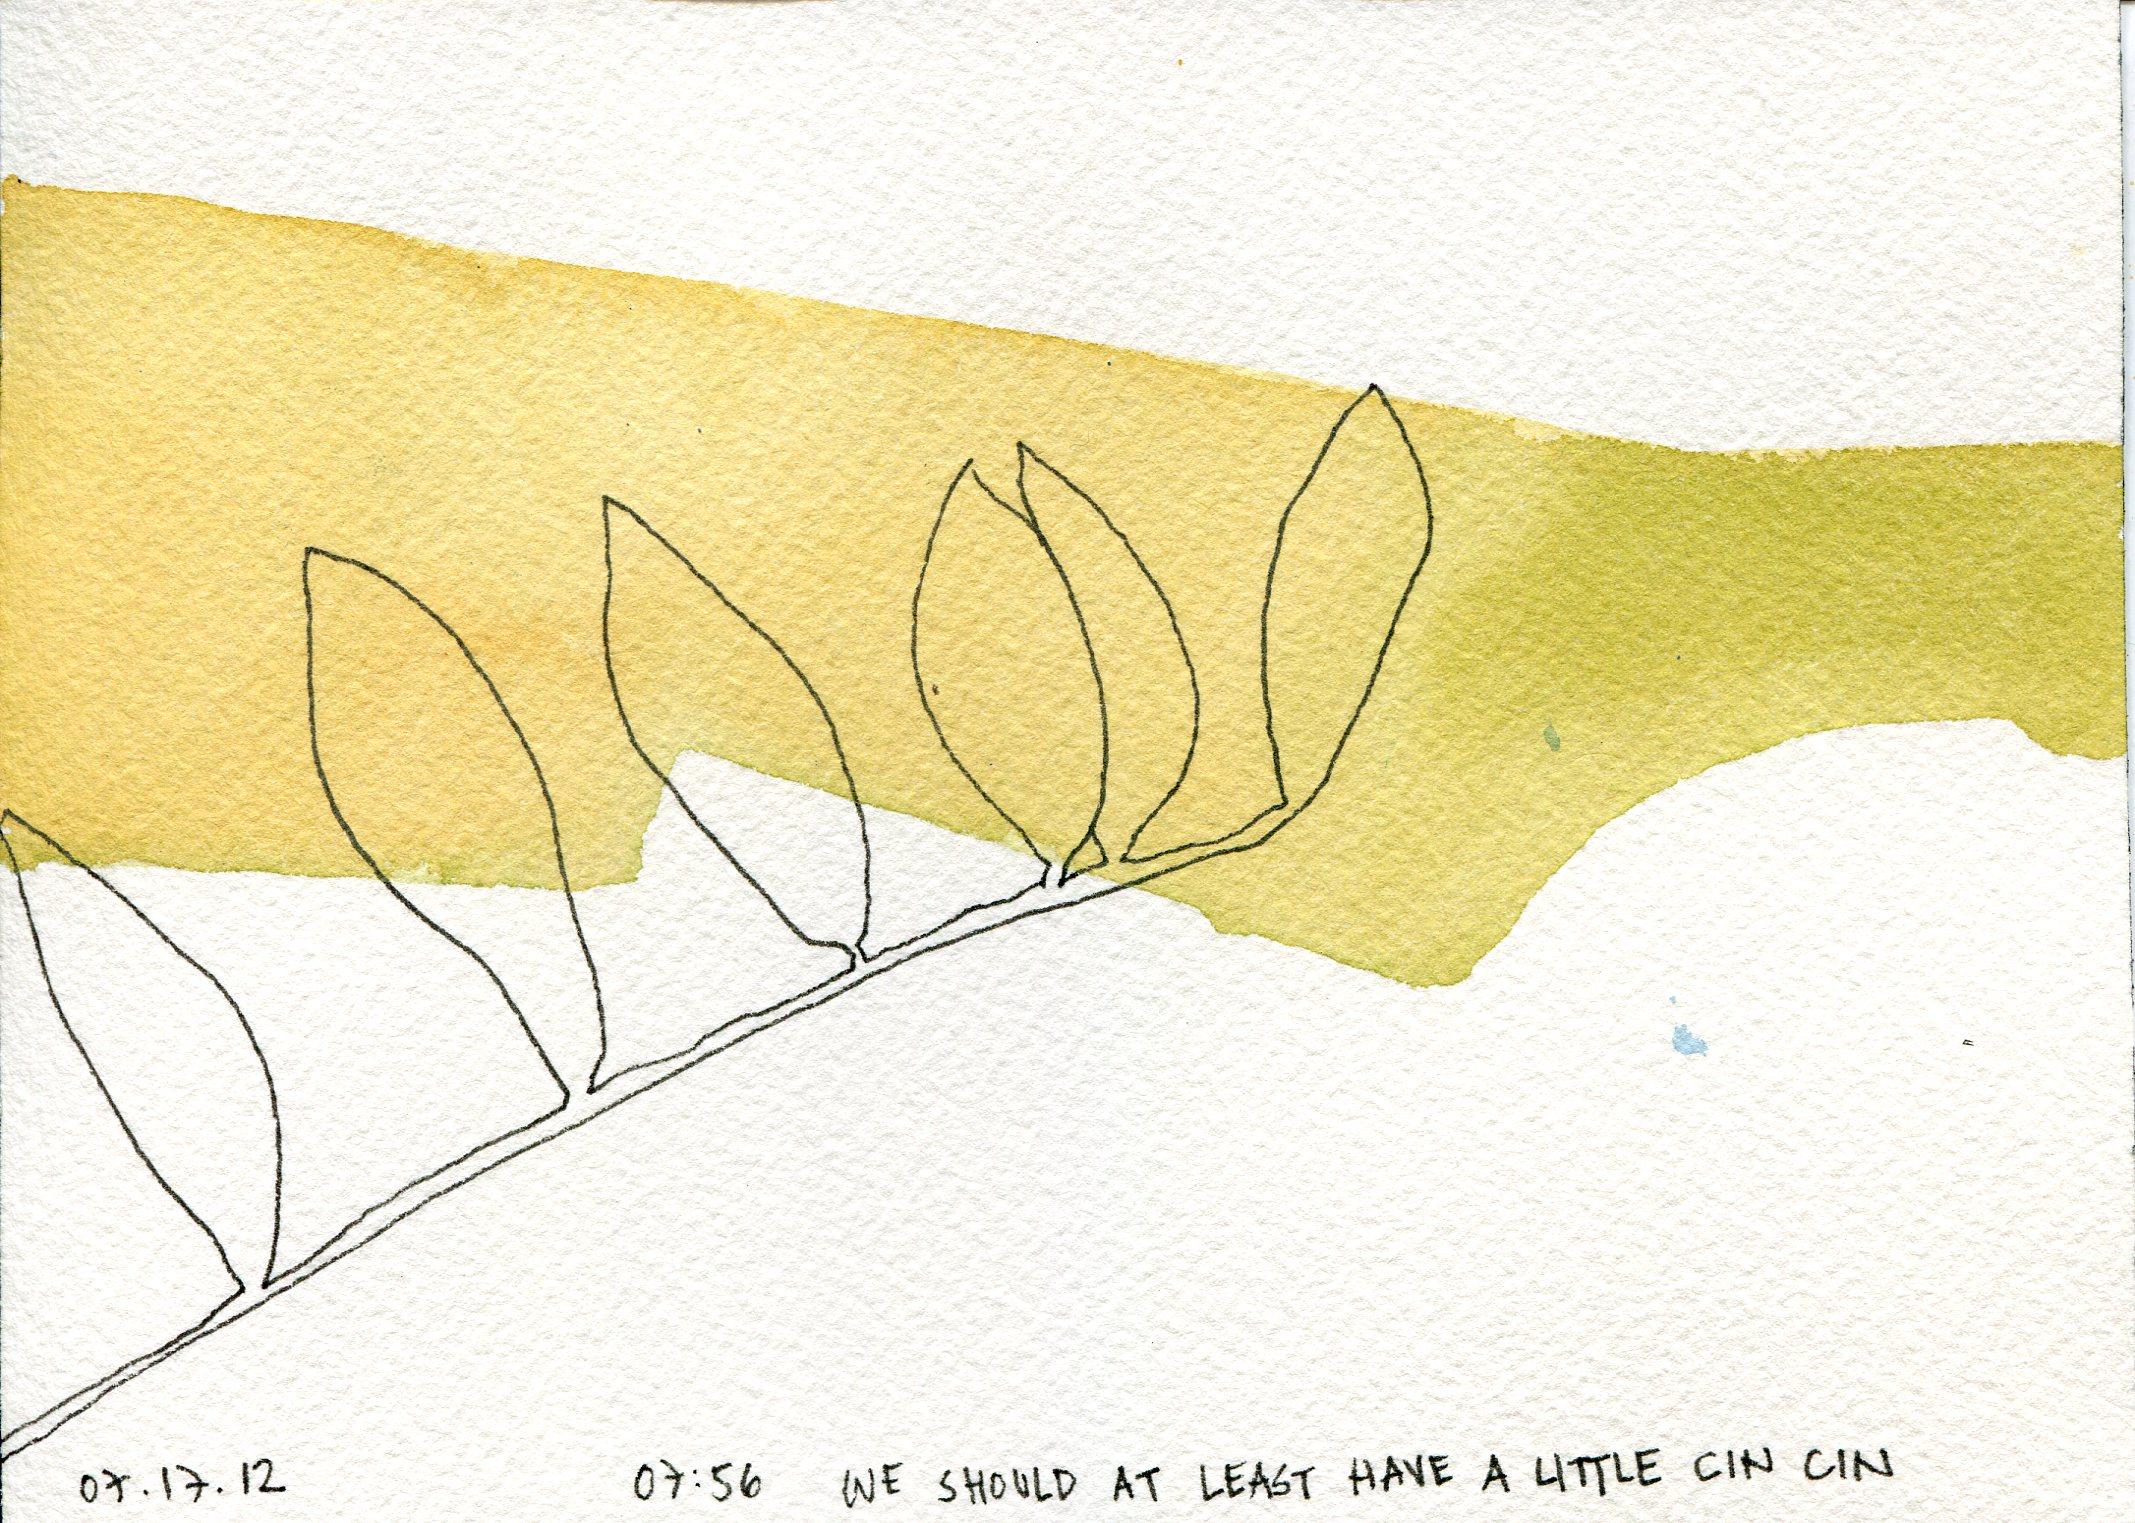 2012-07-21 drawing003.jpg